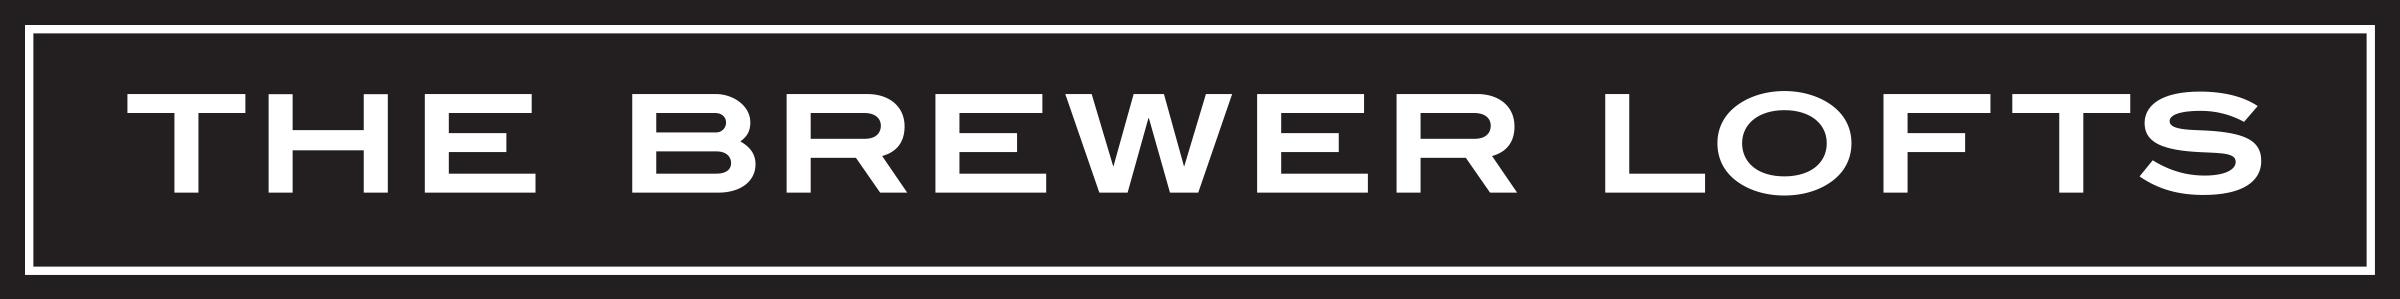 https://riverwalkniagarafalls.com/wp-content/uploads/2021/01/cropped-tbl-logo-wide.png